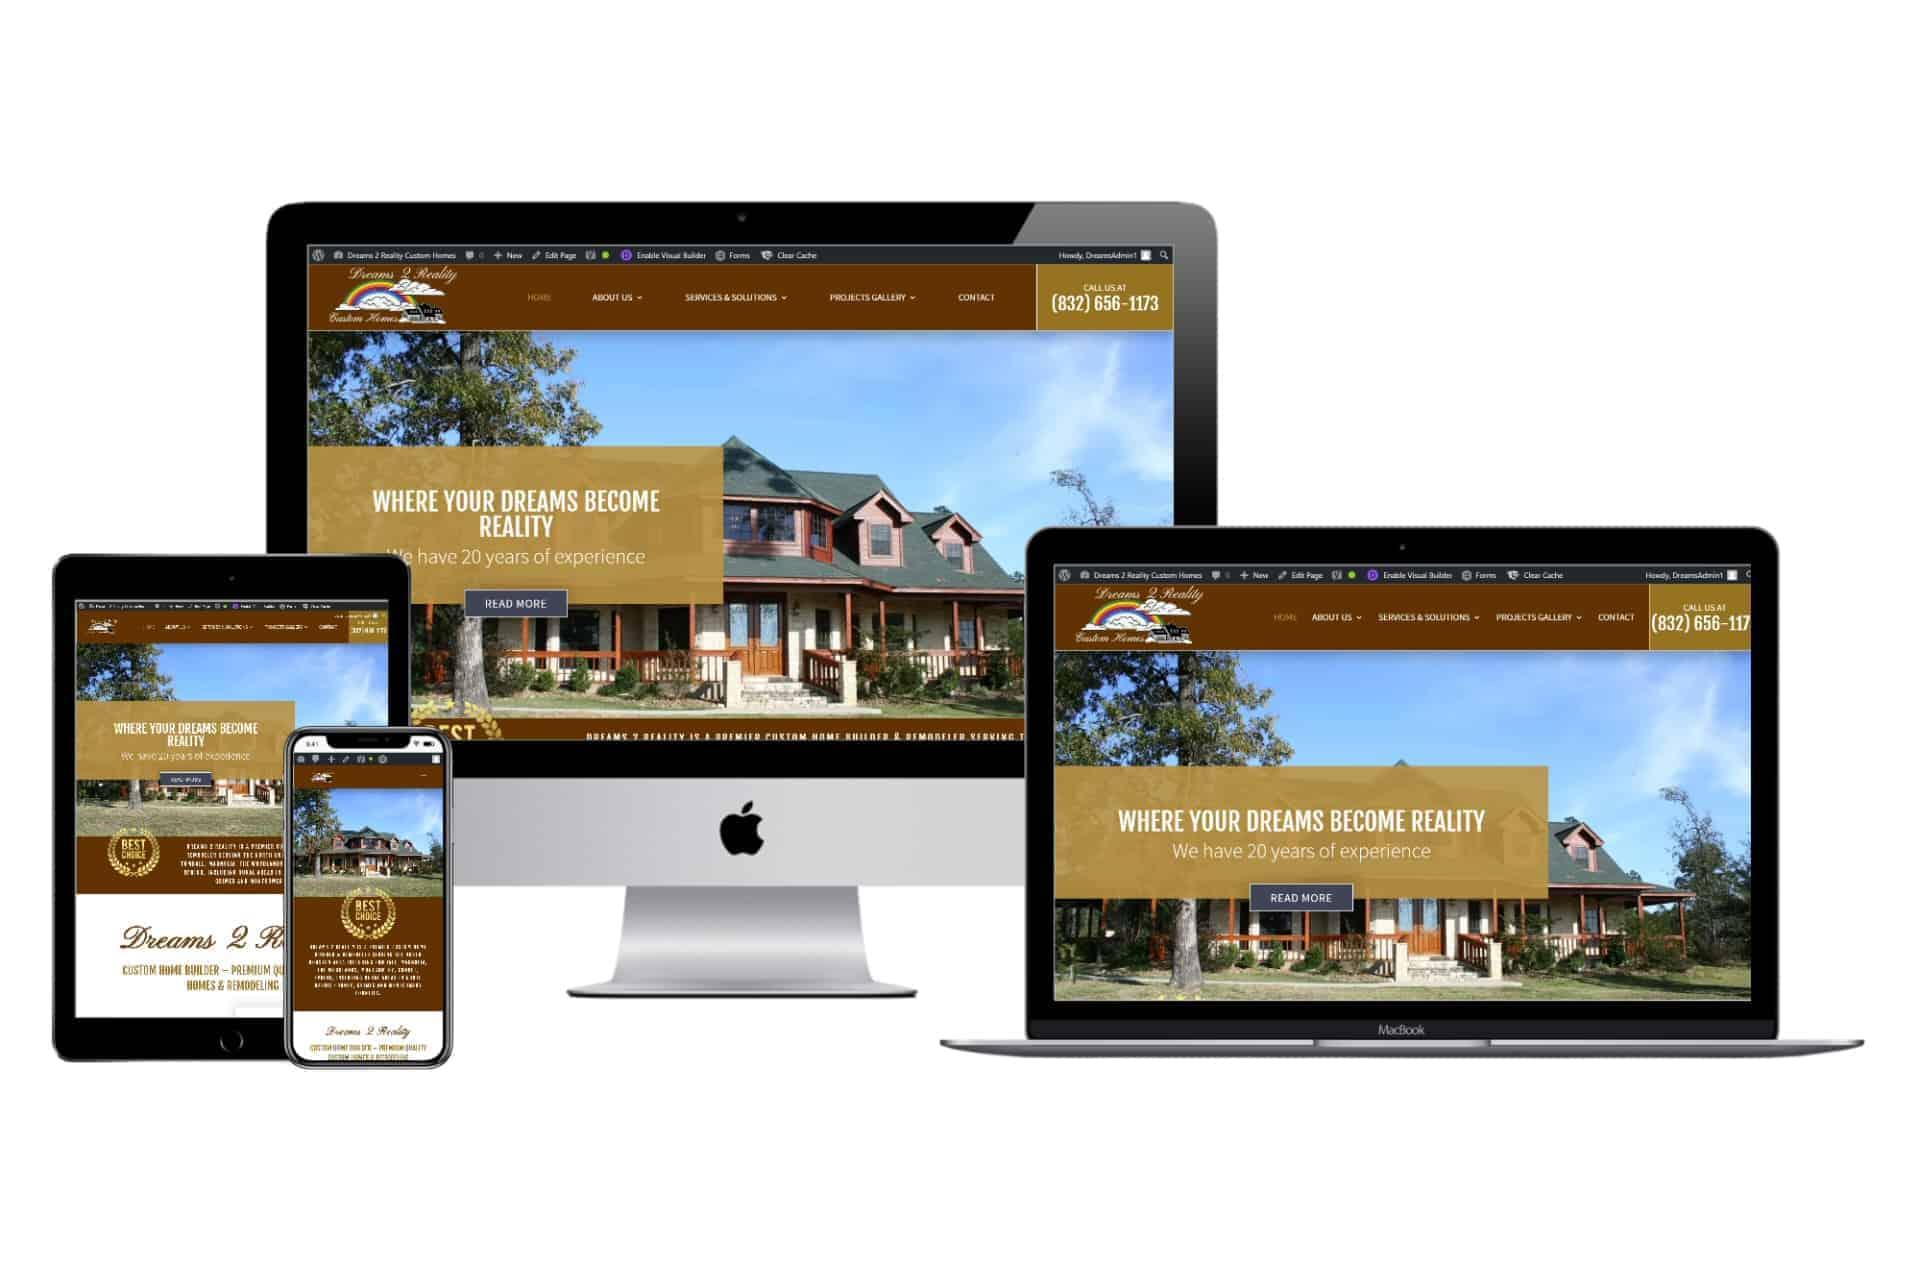 Dreams 2 Reality Custom Home Builder Website Design by WizardsWebs Design